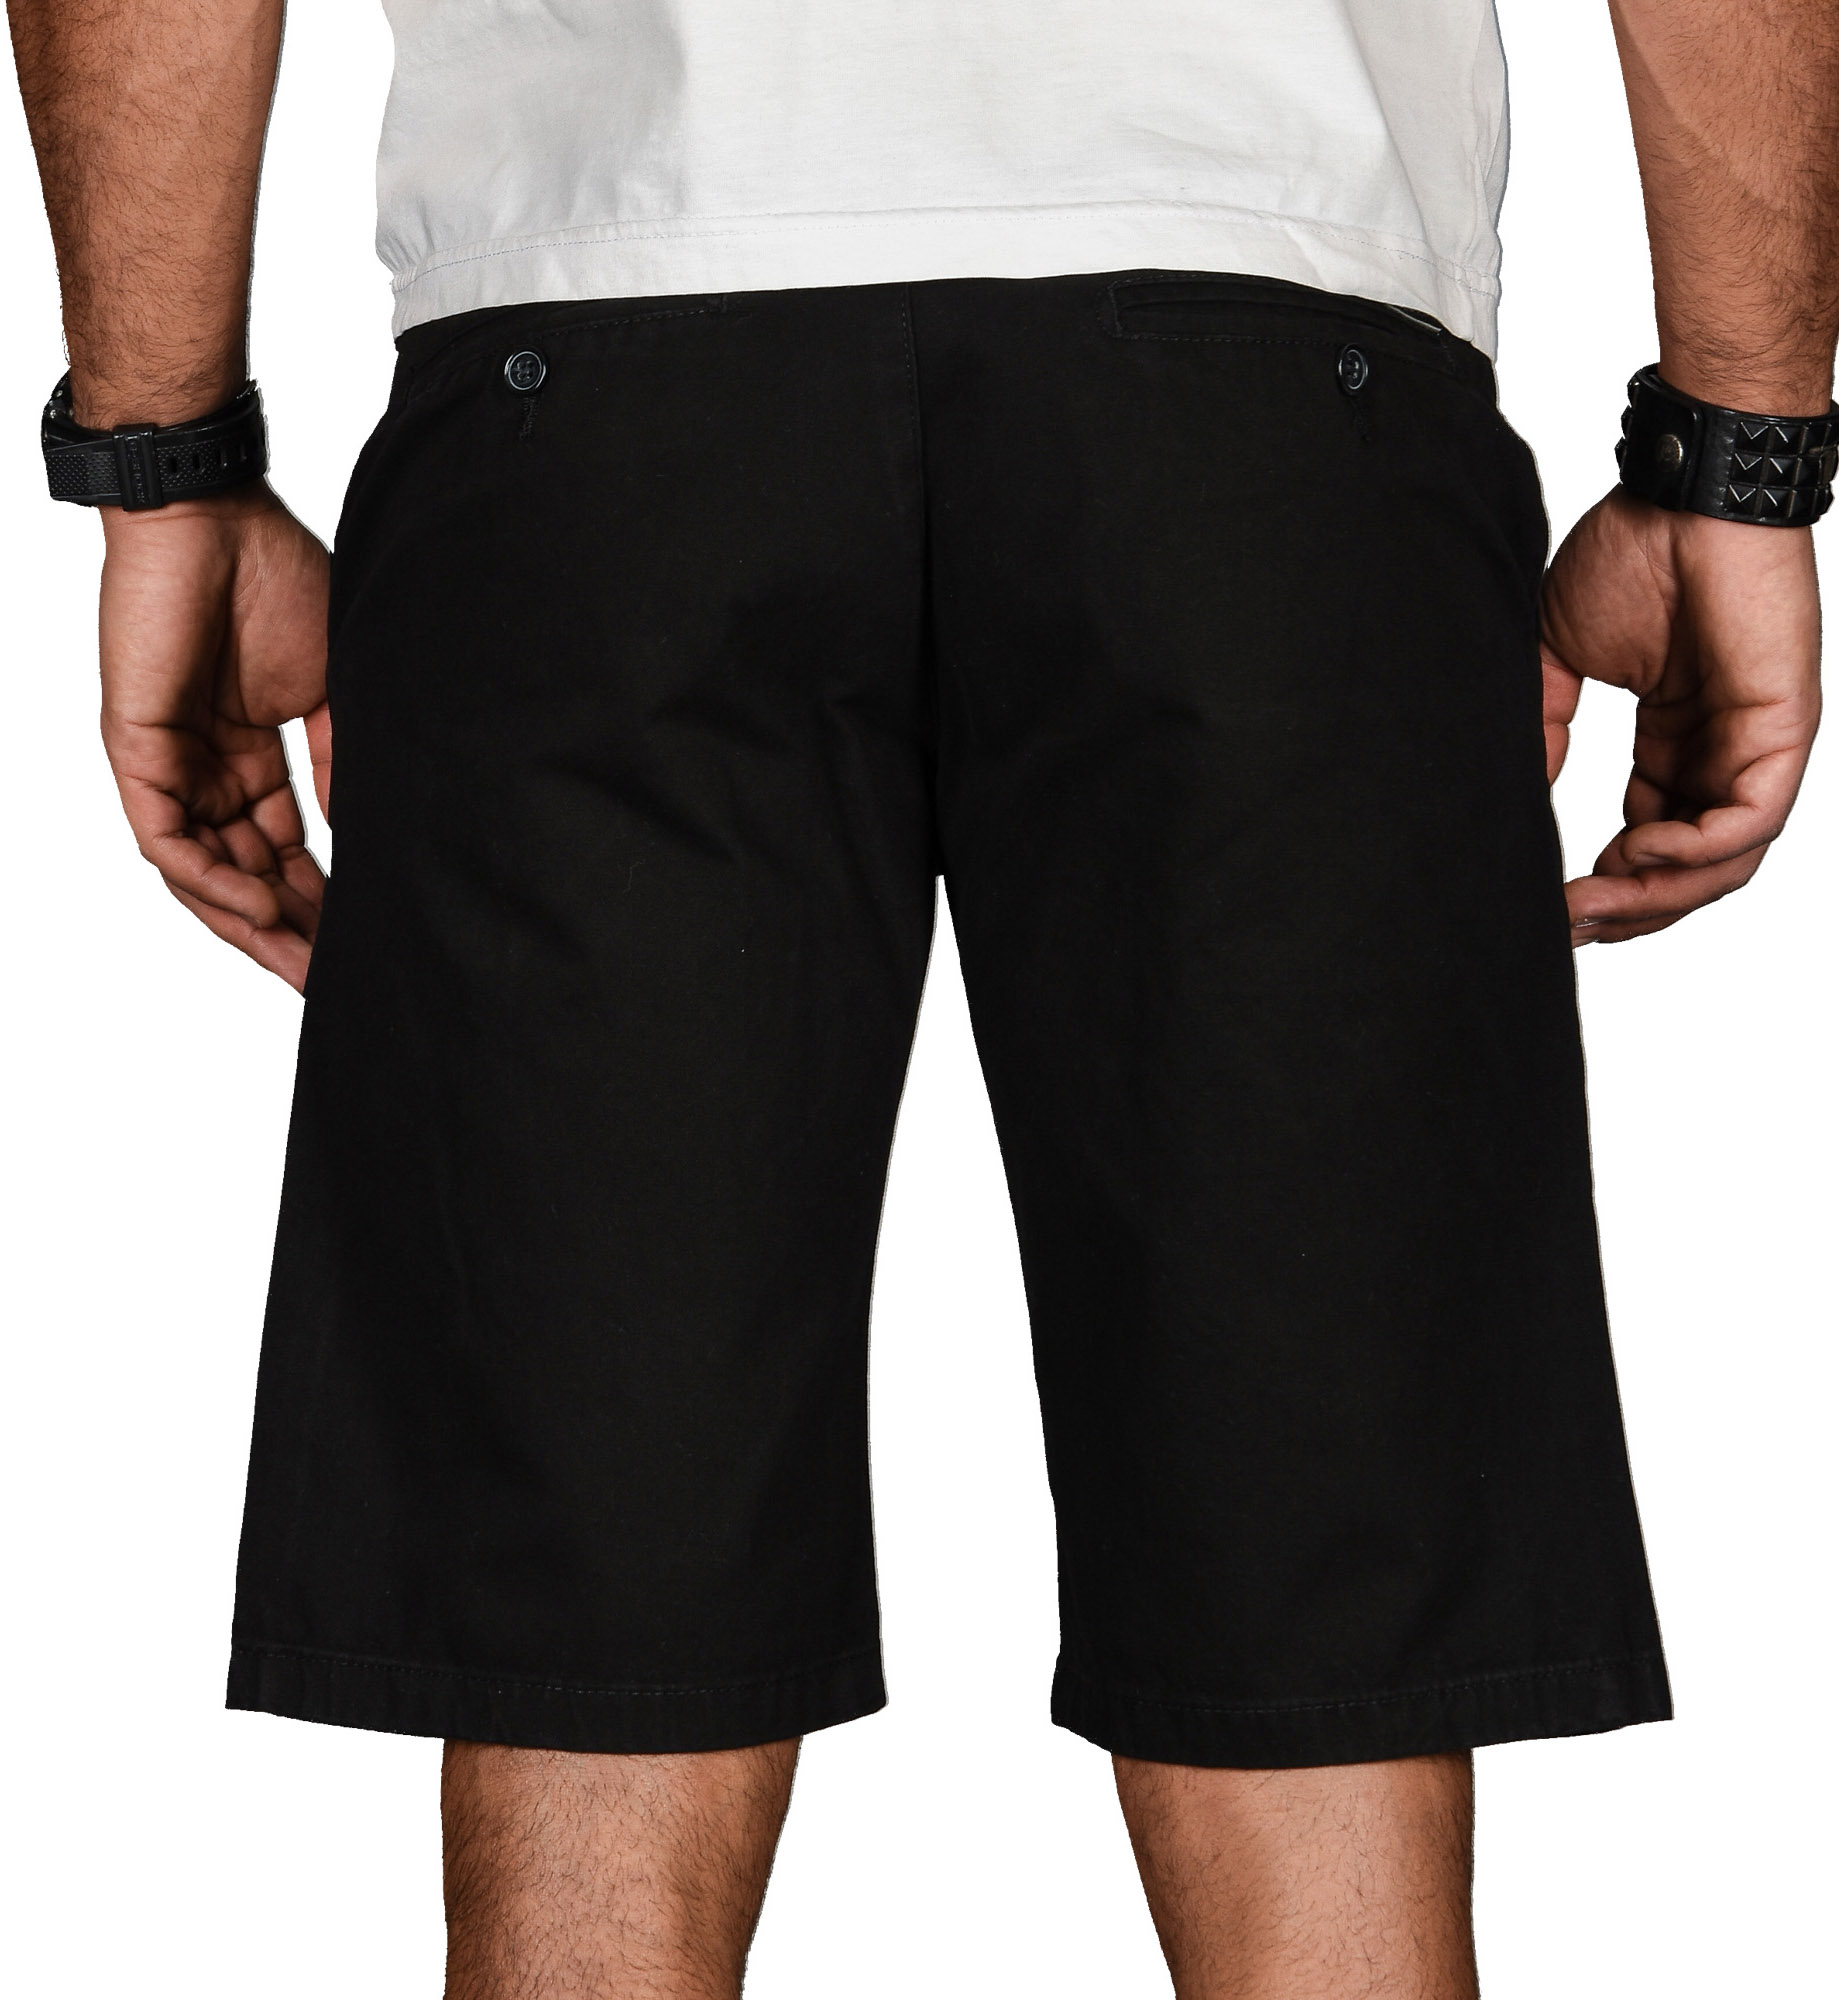 A-Salvarini-Herren-Shorts-kurze-Sommer-Hose-mit-Guertel-Short-Bermuda-NEU-AS096 Indexbild 5